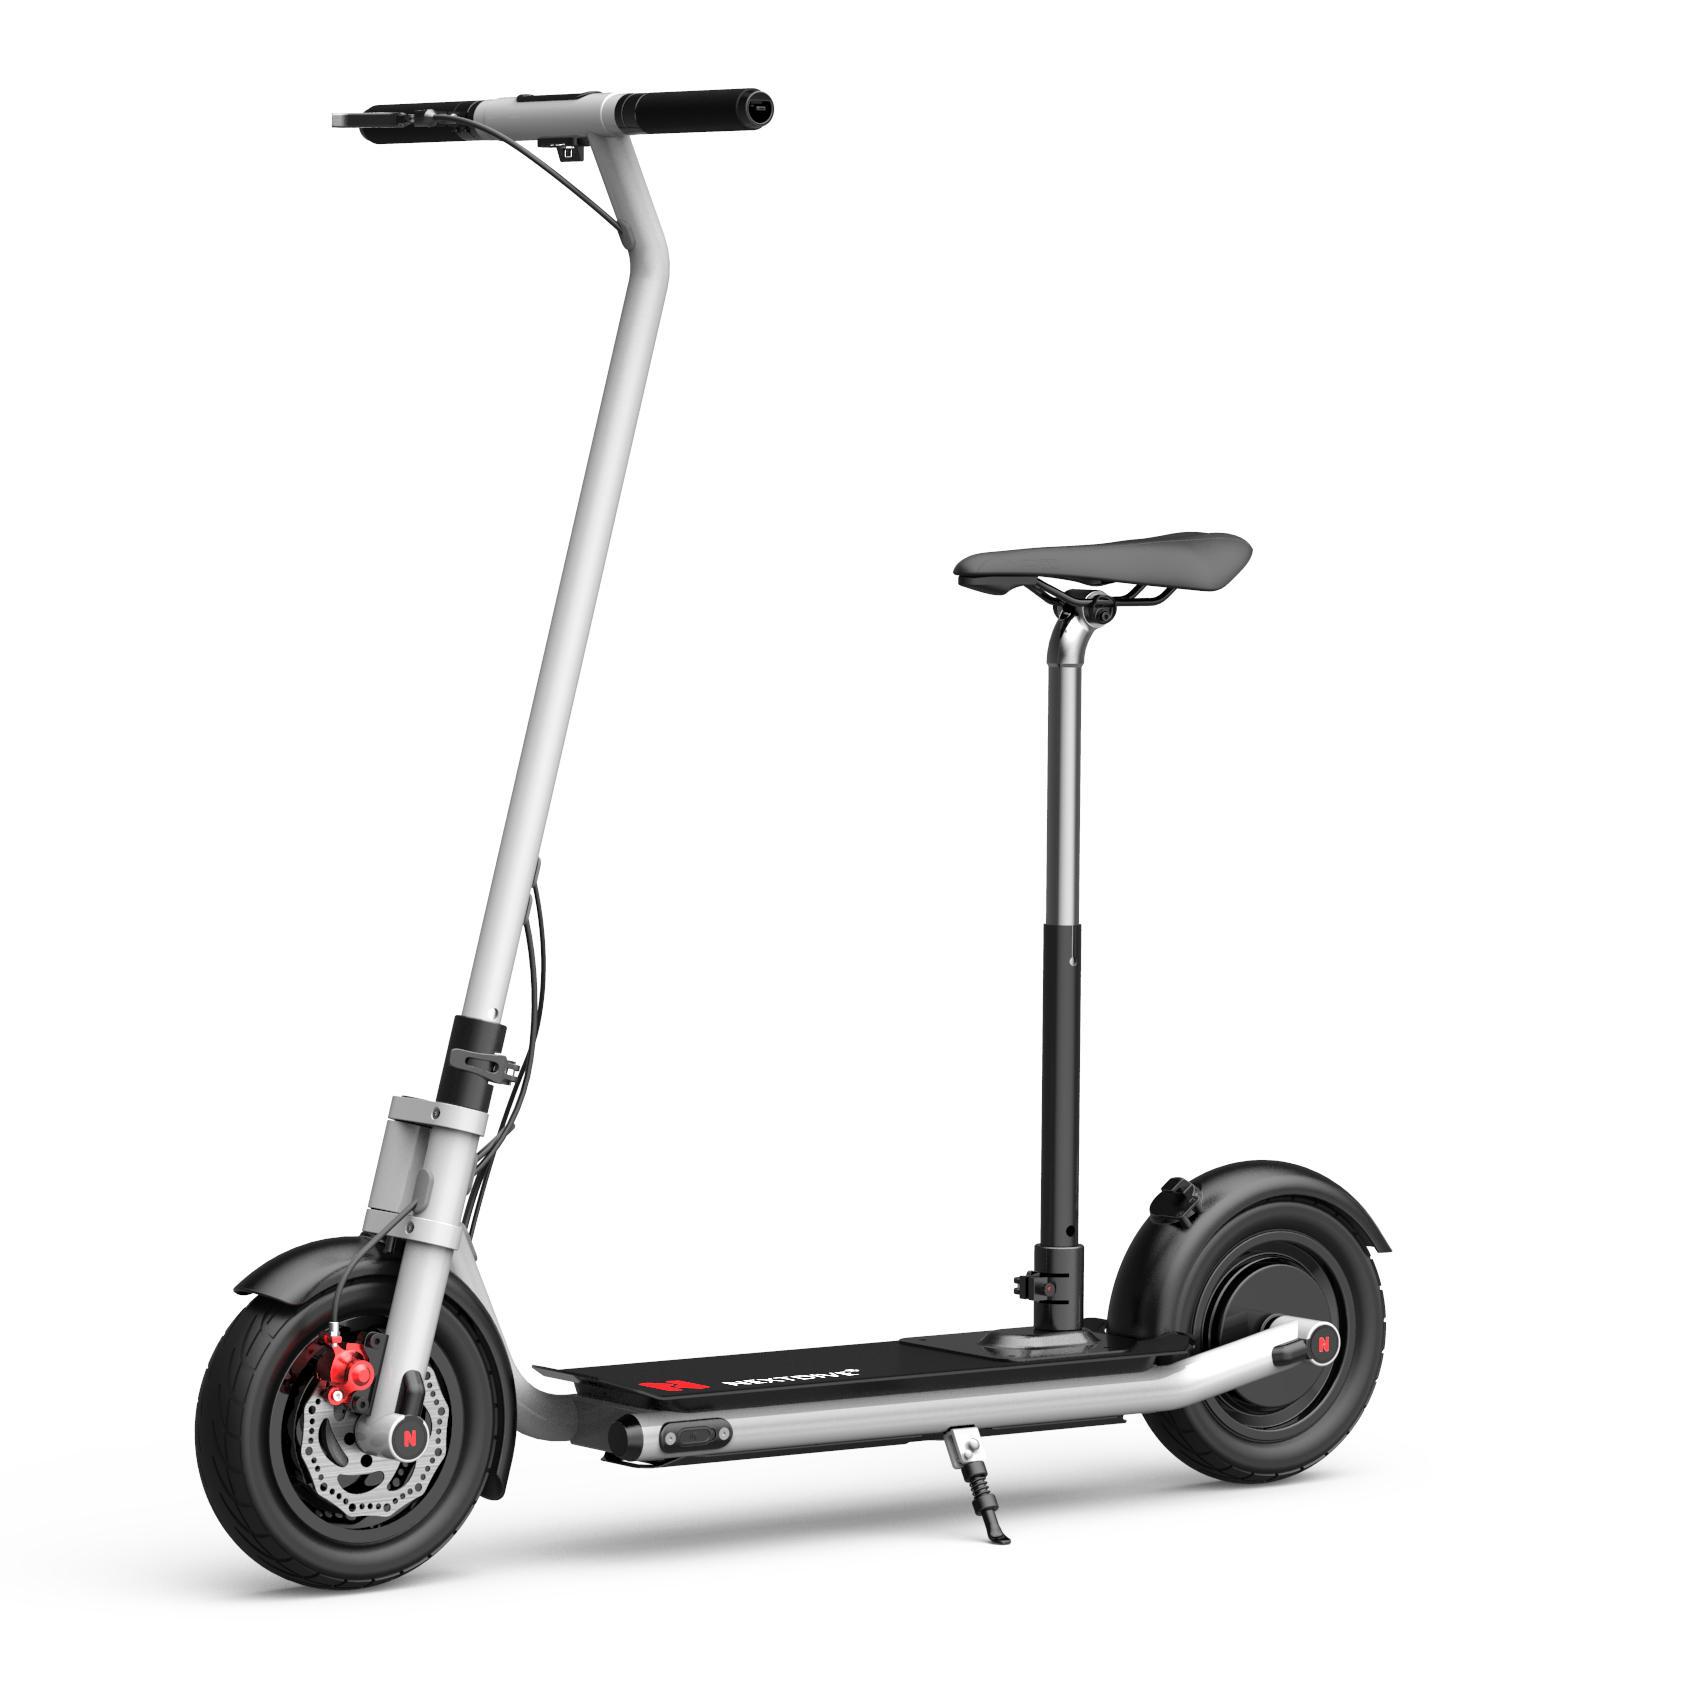 NEXTDRIVE N 7 Foldable Scooter